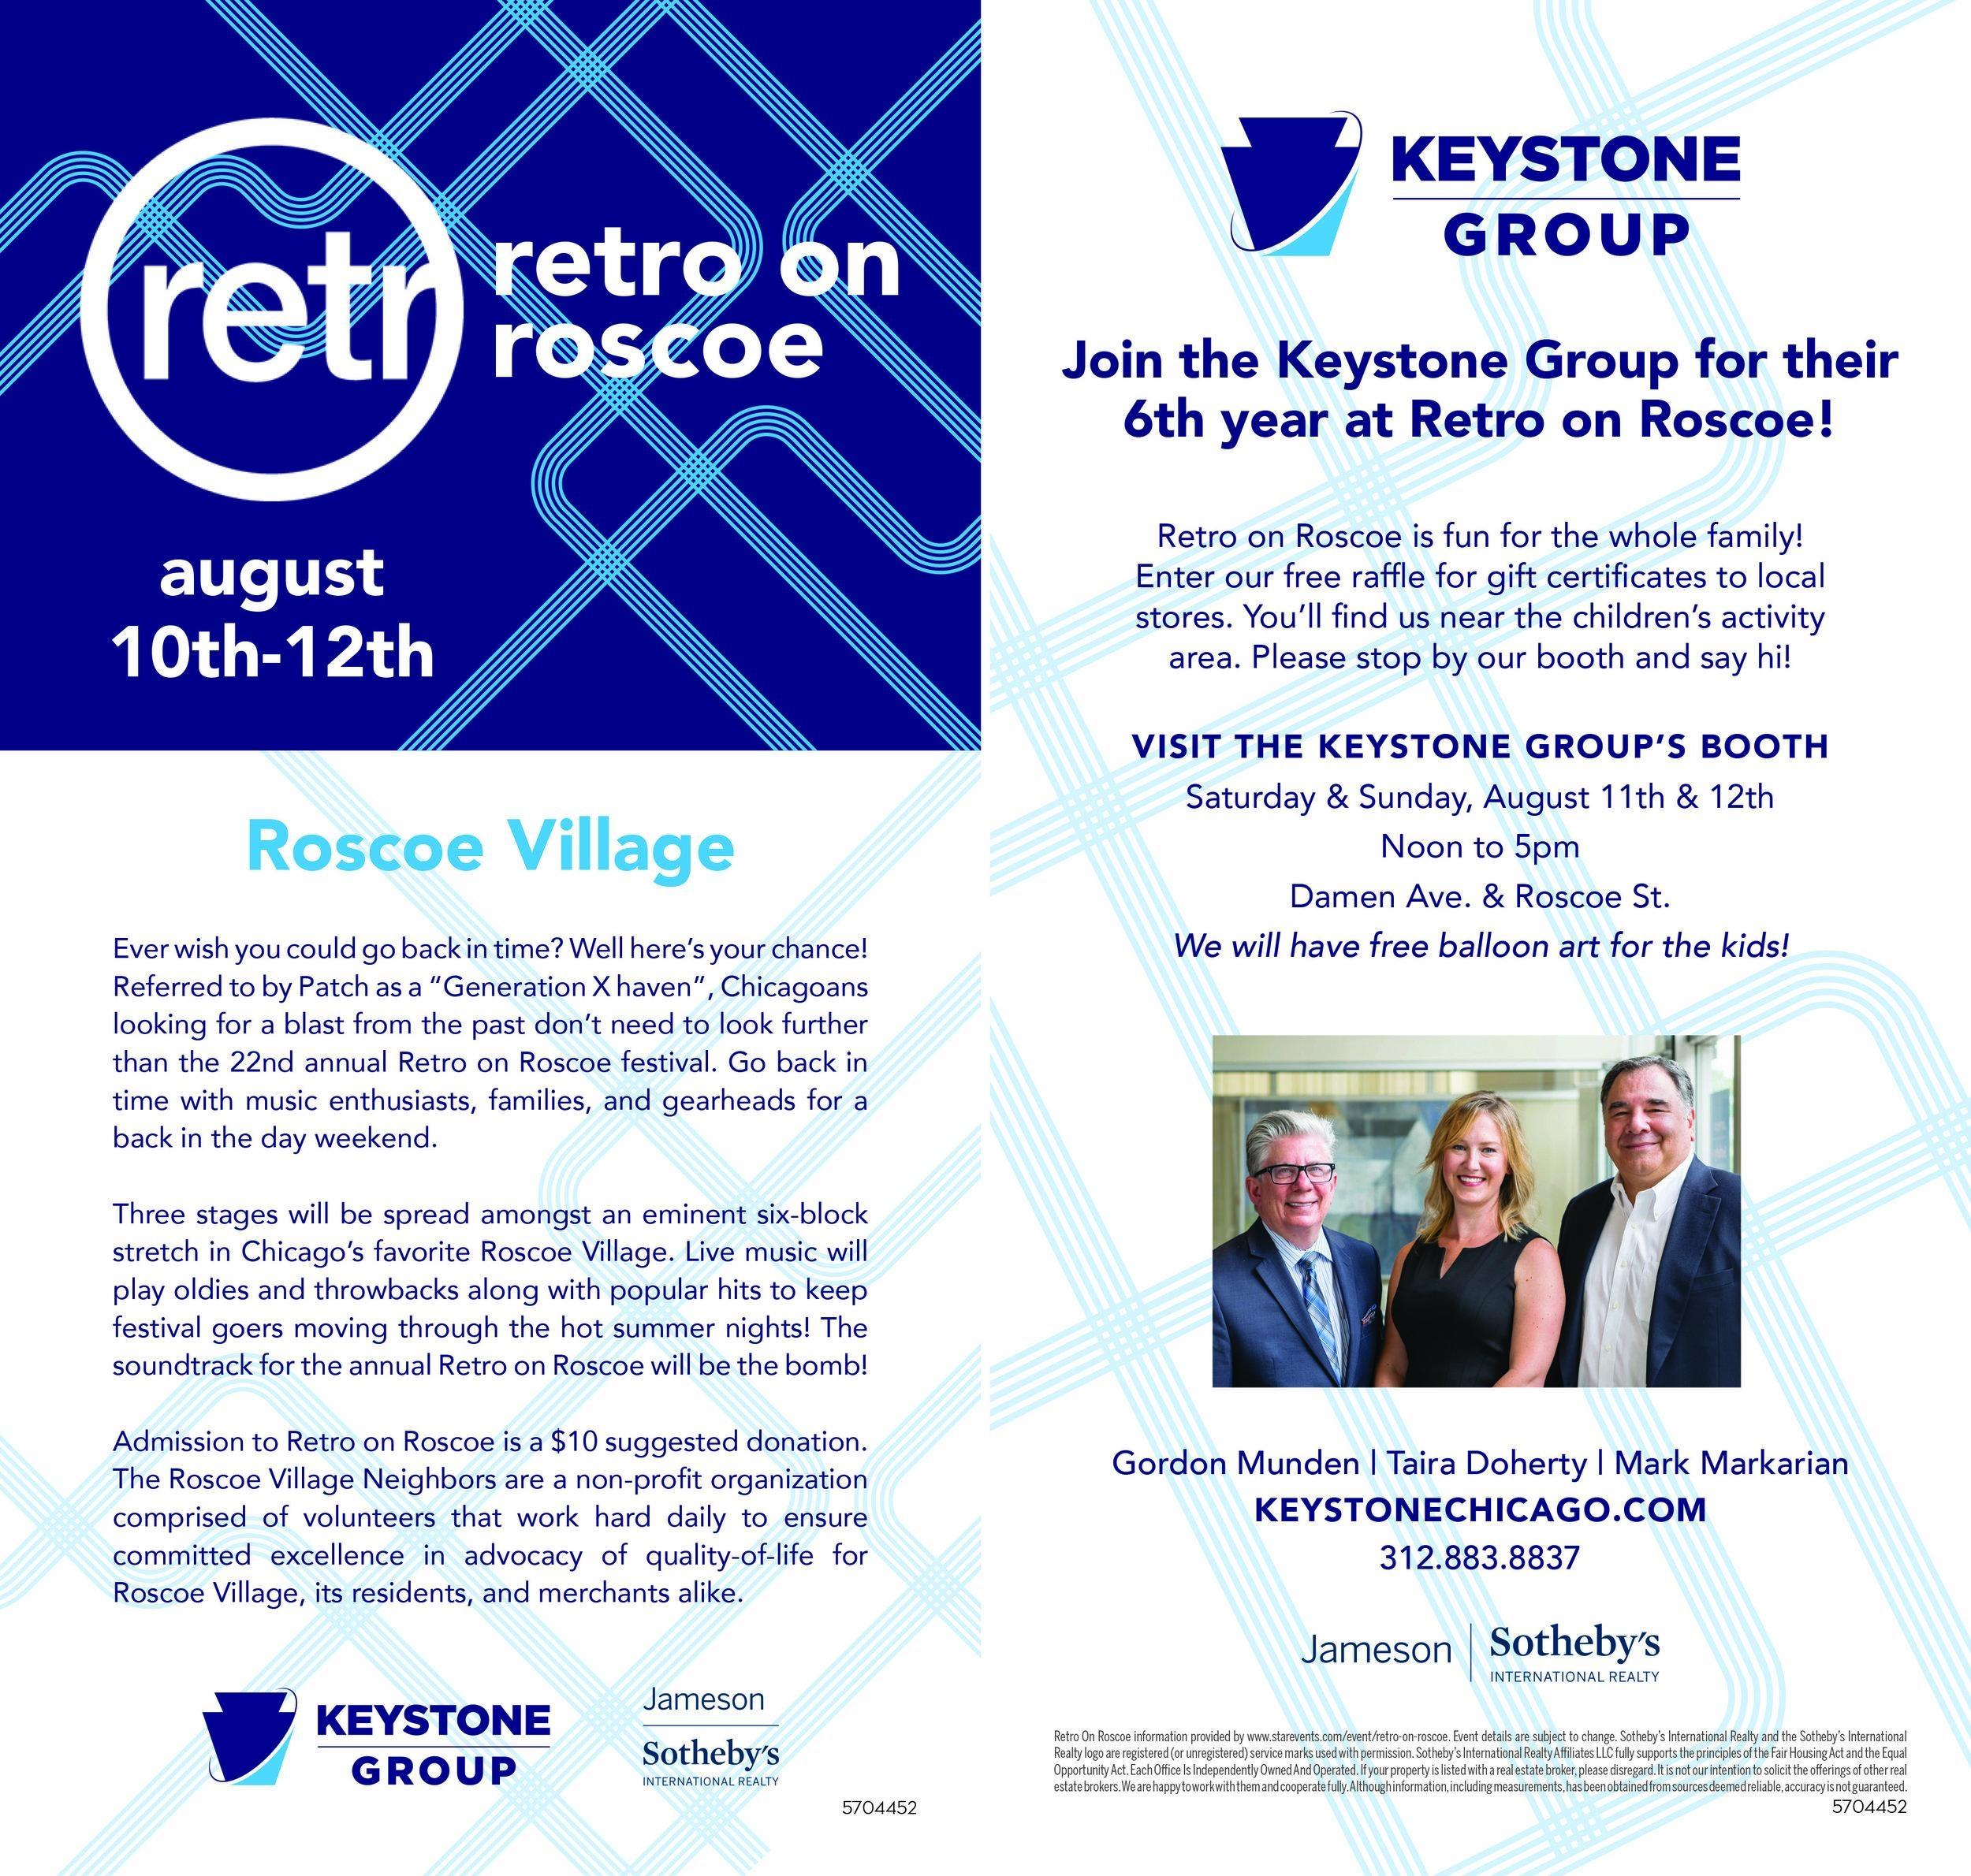 Retro on Roscoe 2018 Website EZ.jpg